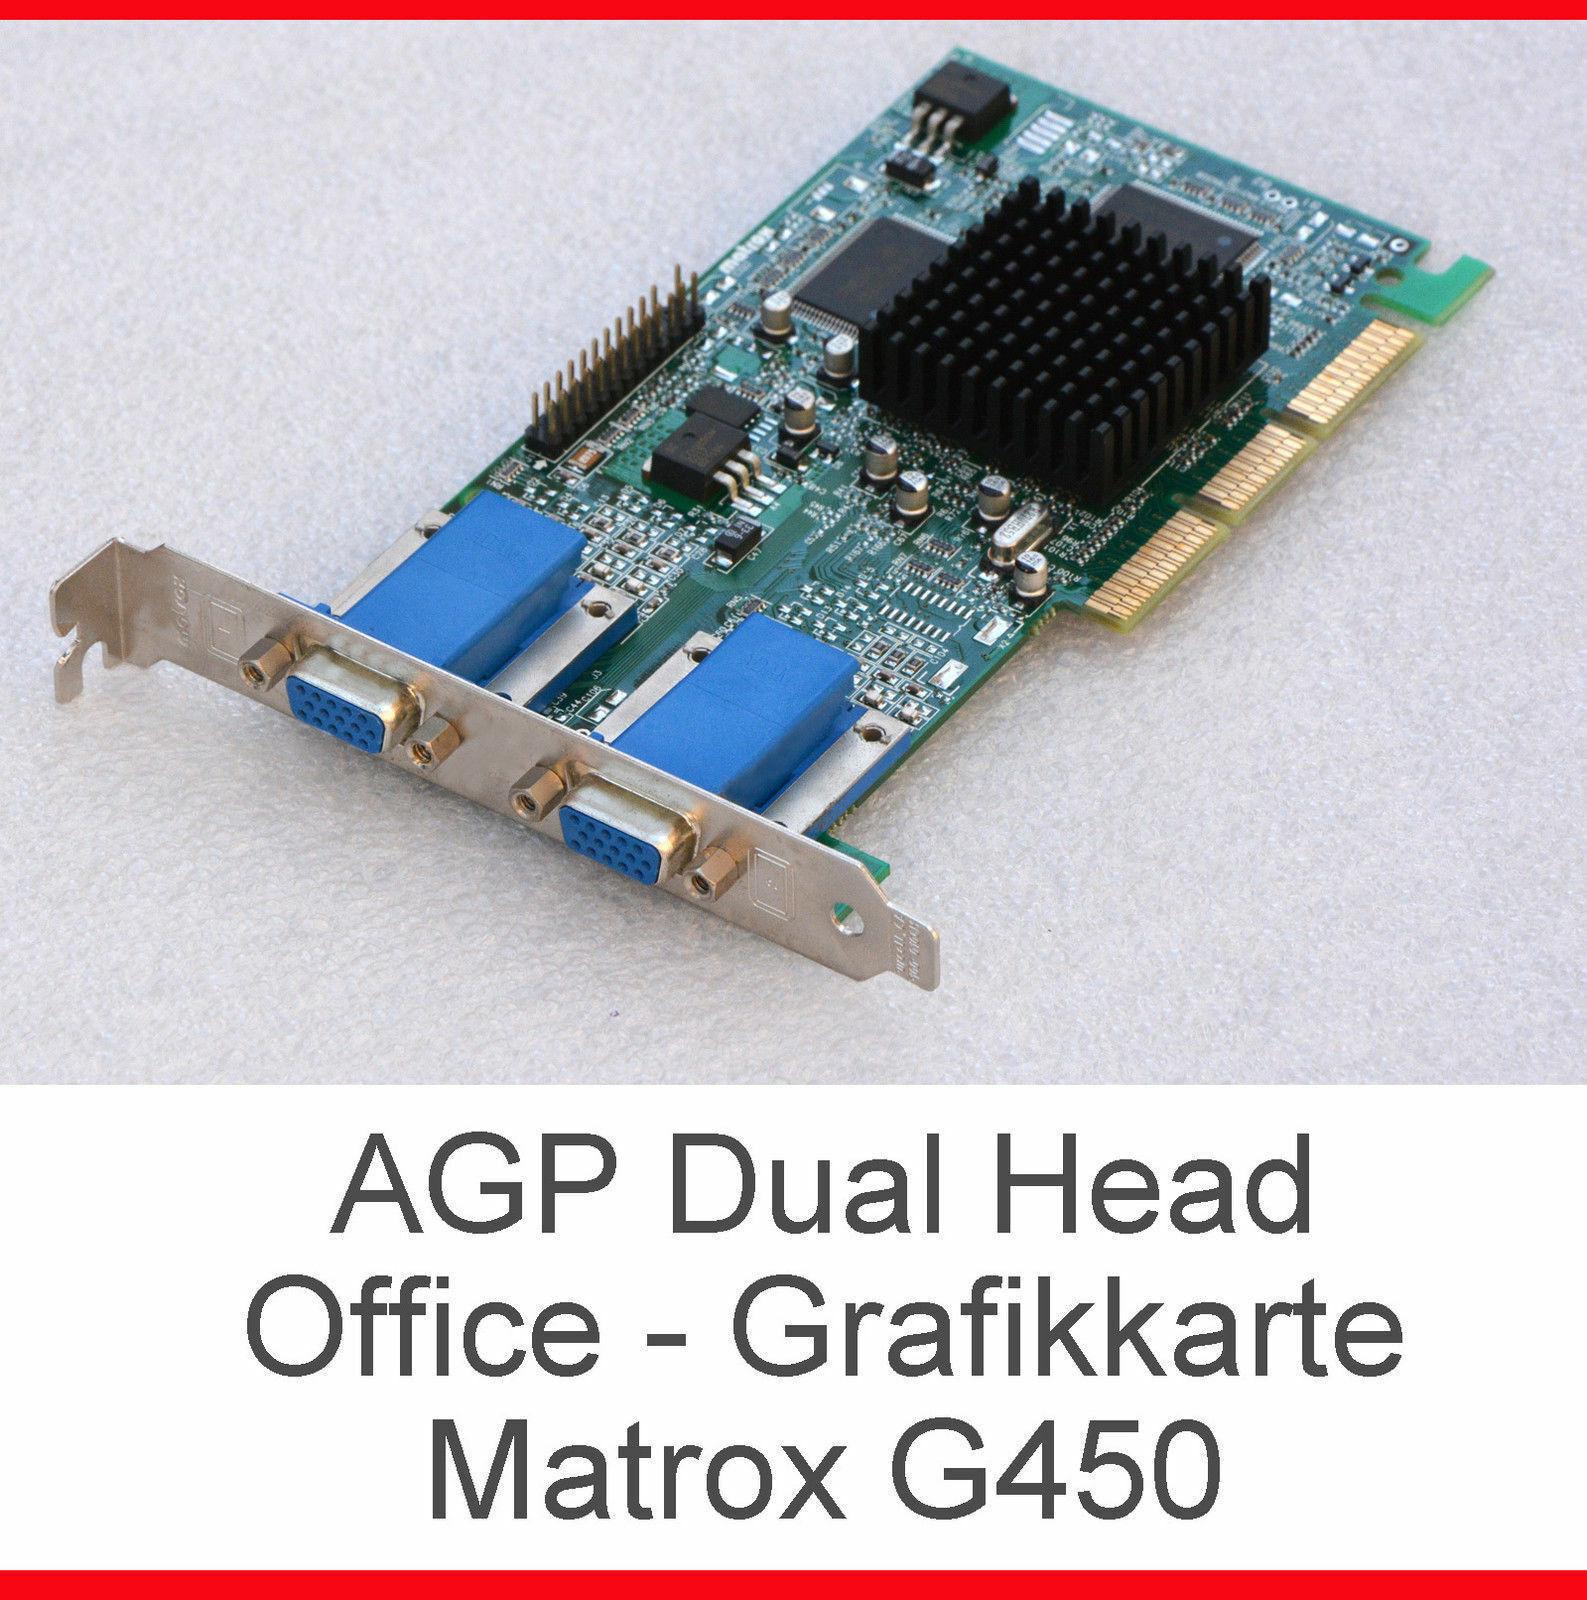 PASSIVKÜHLER MGA DUAL HEAD 3D GRAFIKKARTE FÜR 2 MONITORE MATROX G45+ 32MB #G20